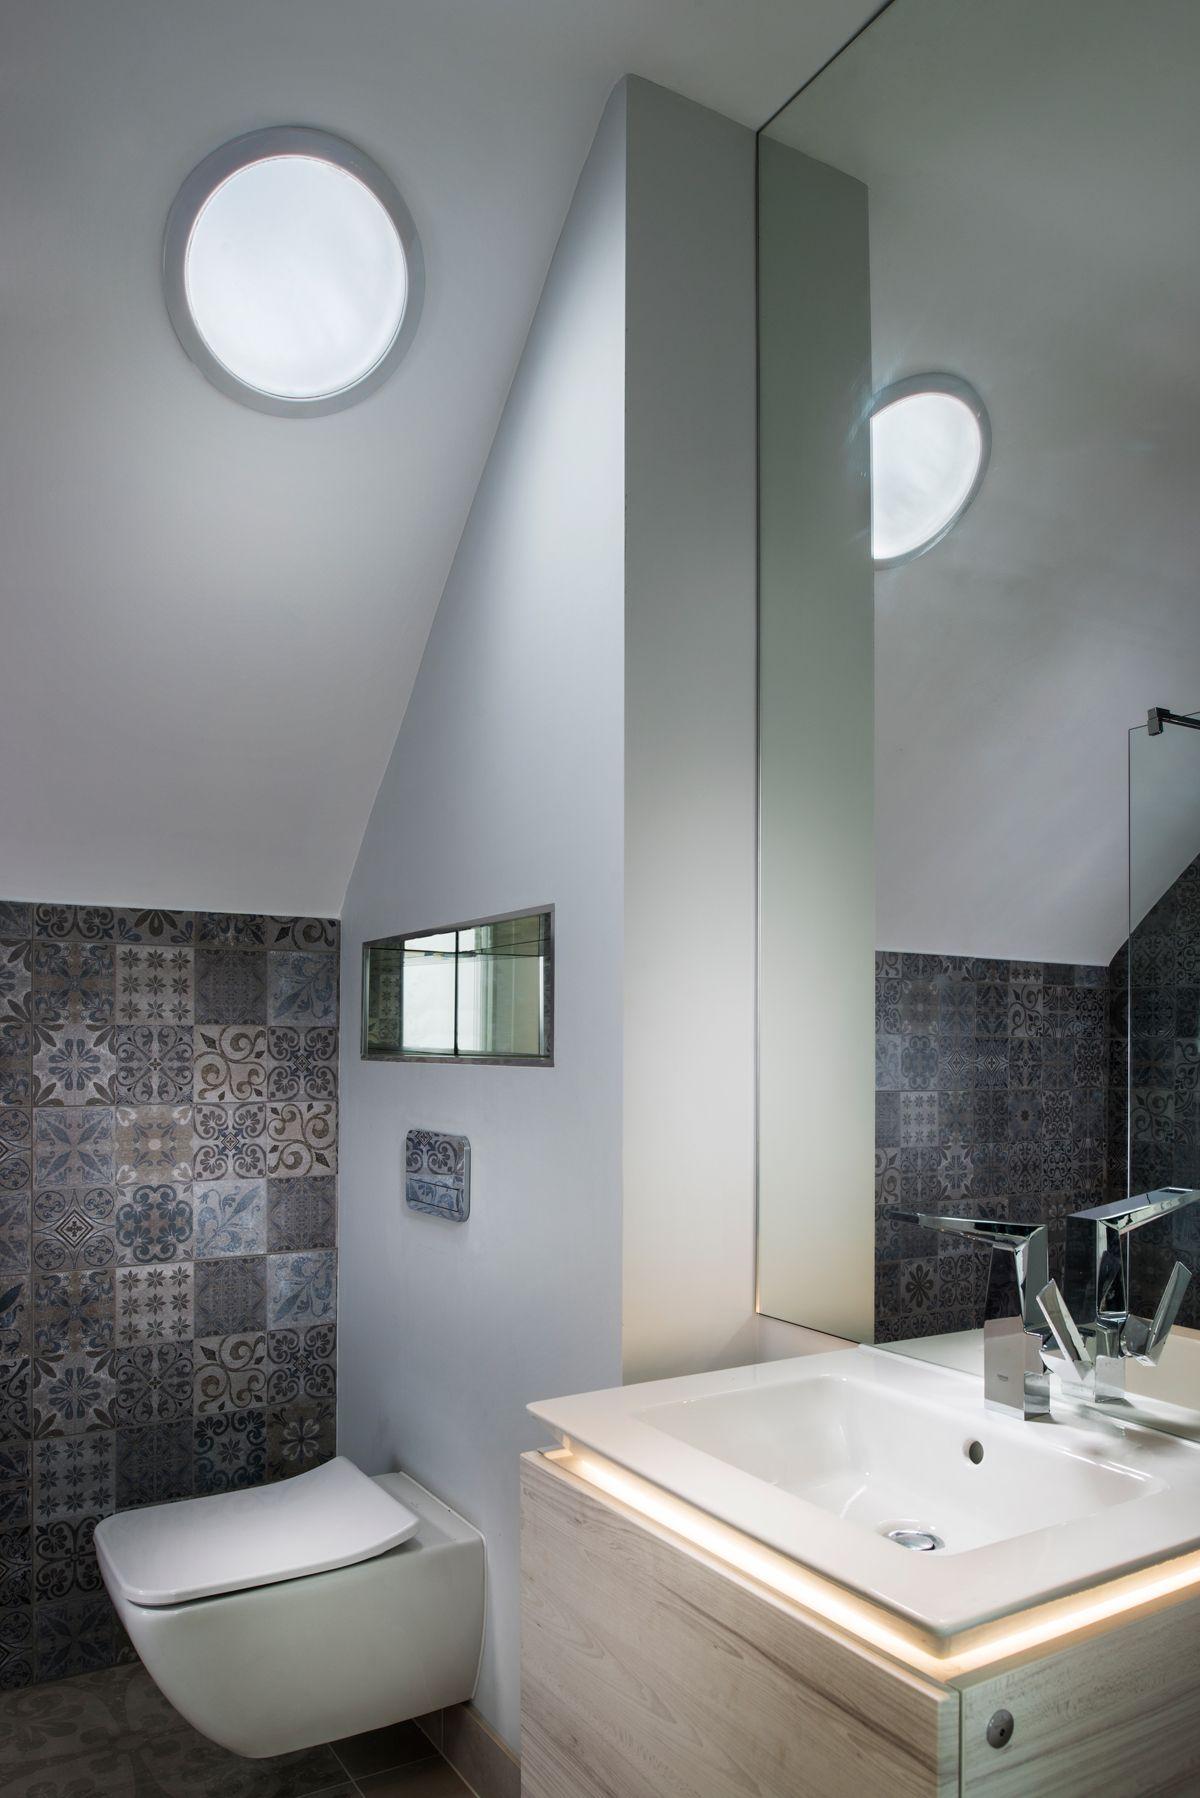 Building Regulations For Skylights Rooflights Skylights Sun Skylight Bathroom Windowless Bathroom Bathroom Makeover